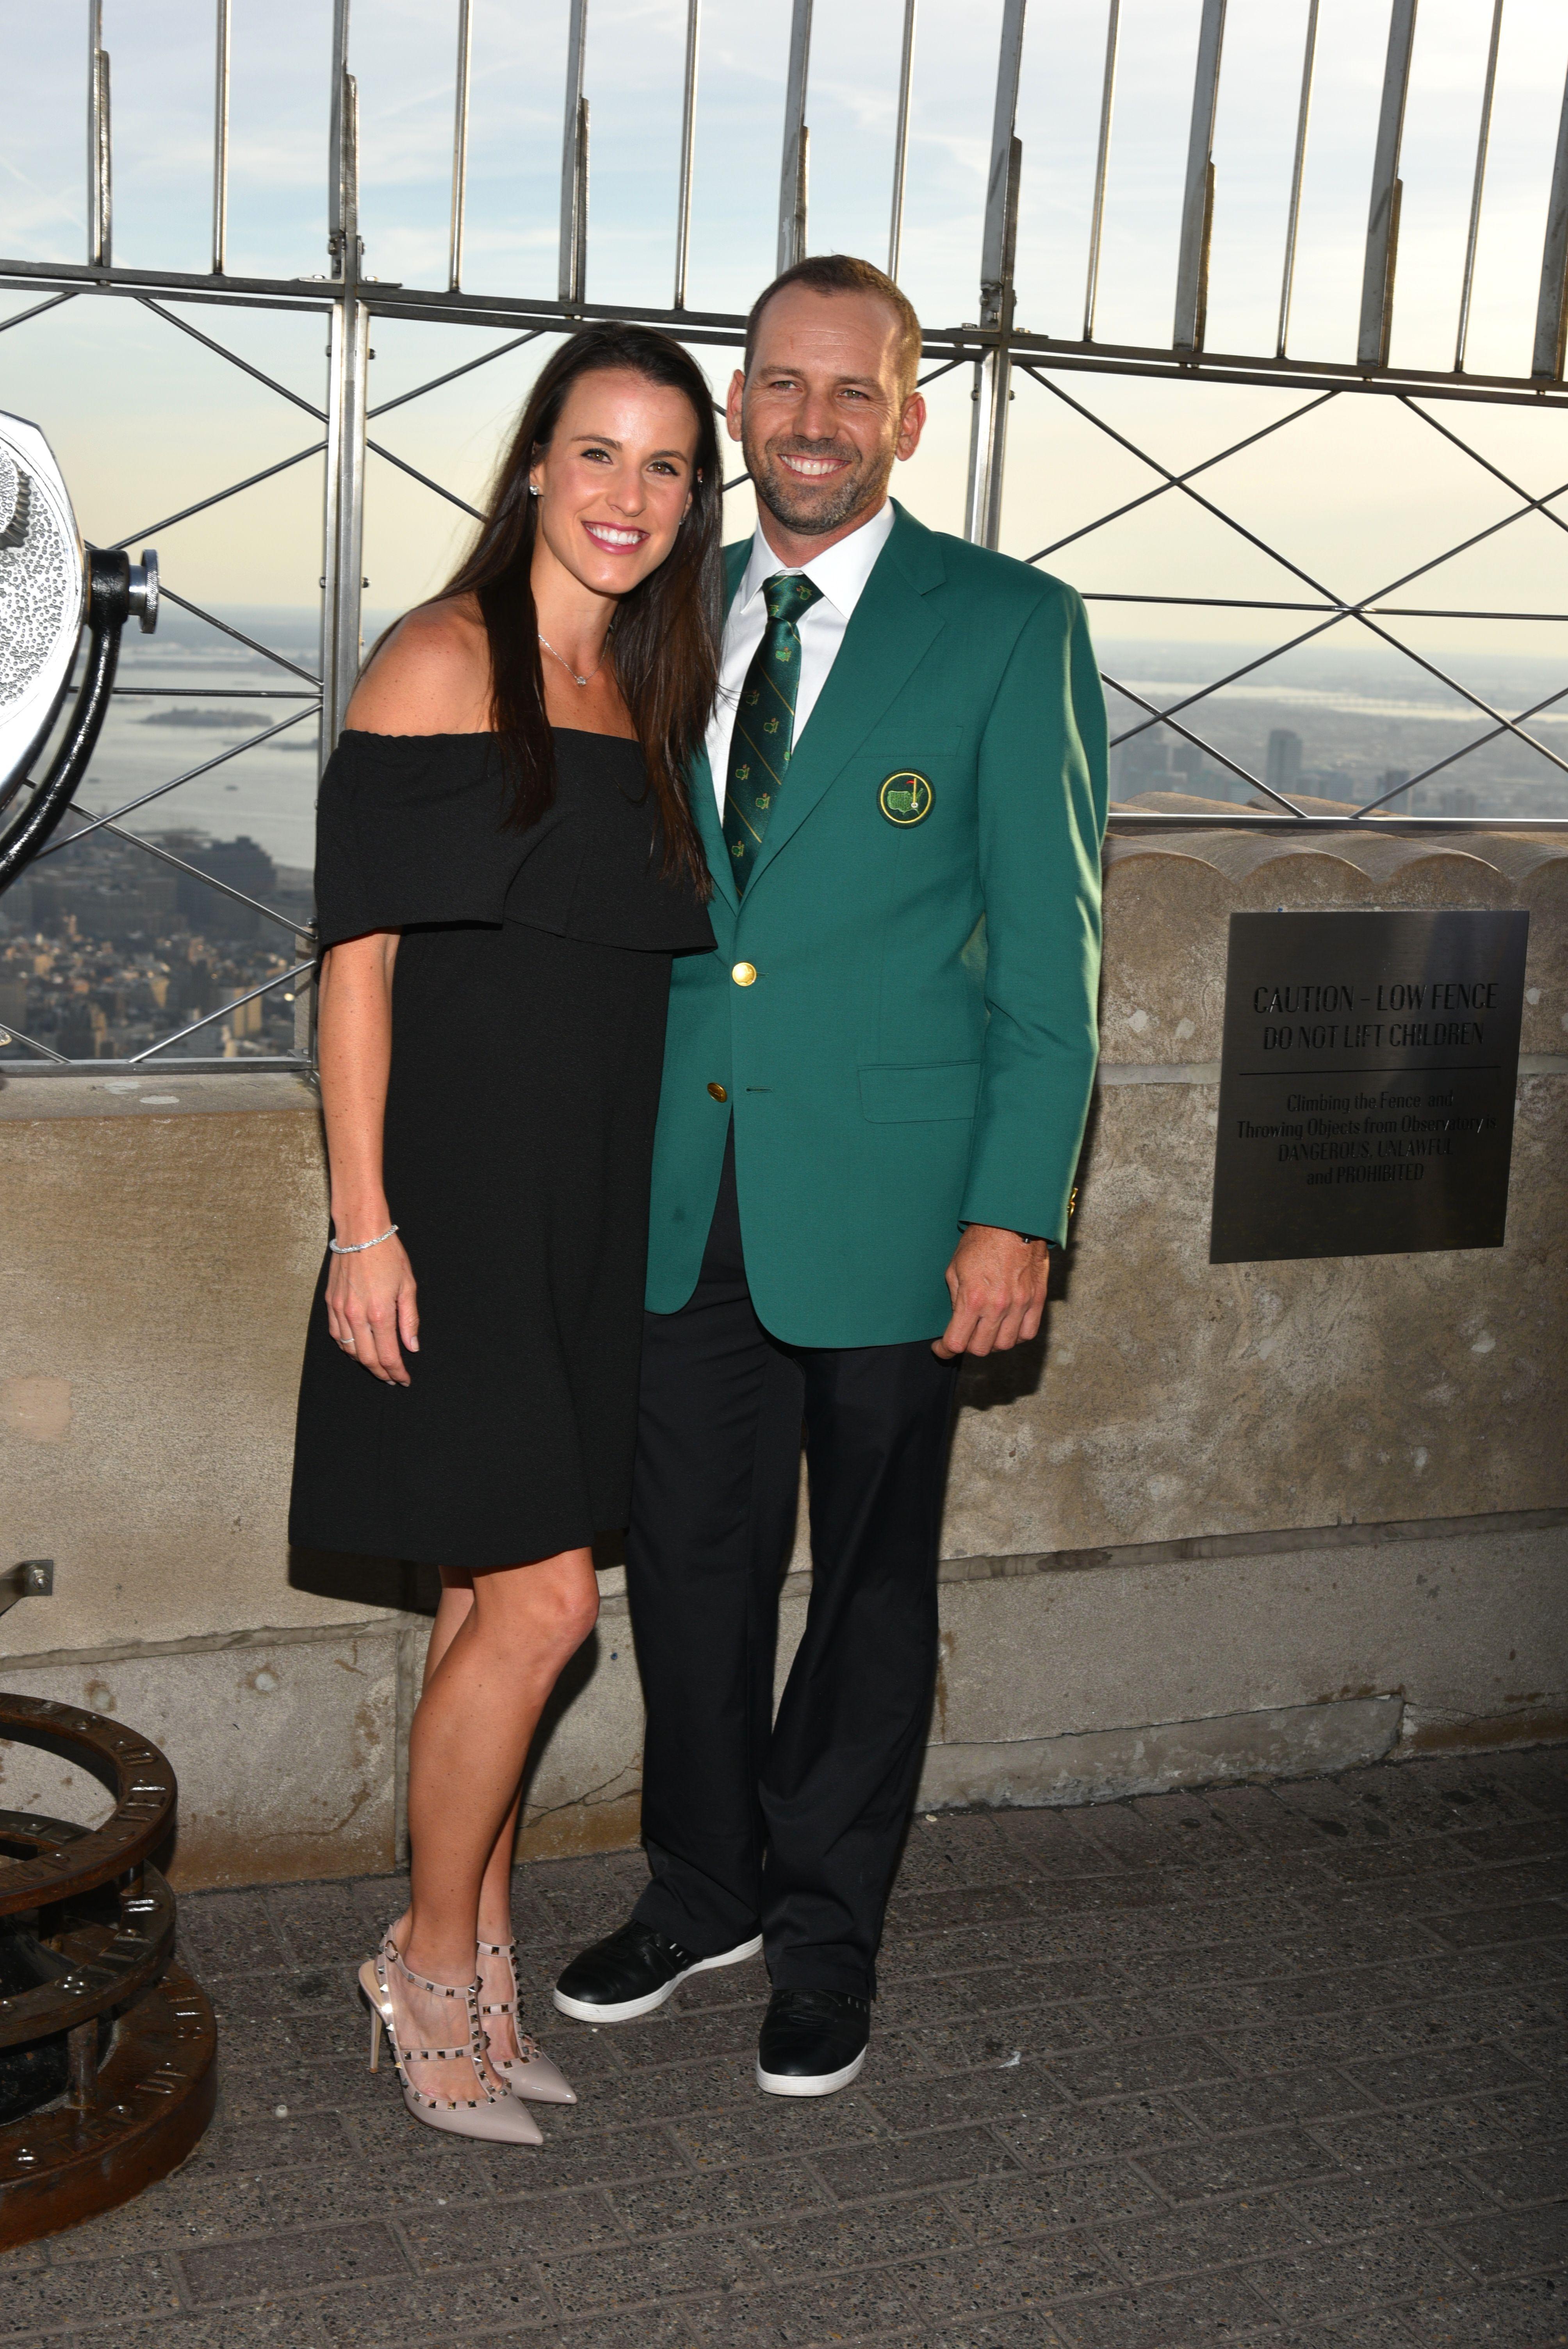 Sergio Garcia married his American wife last year